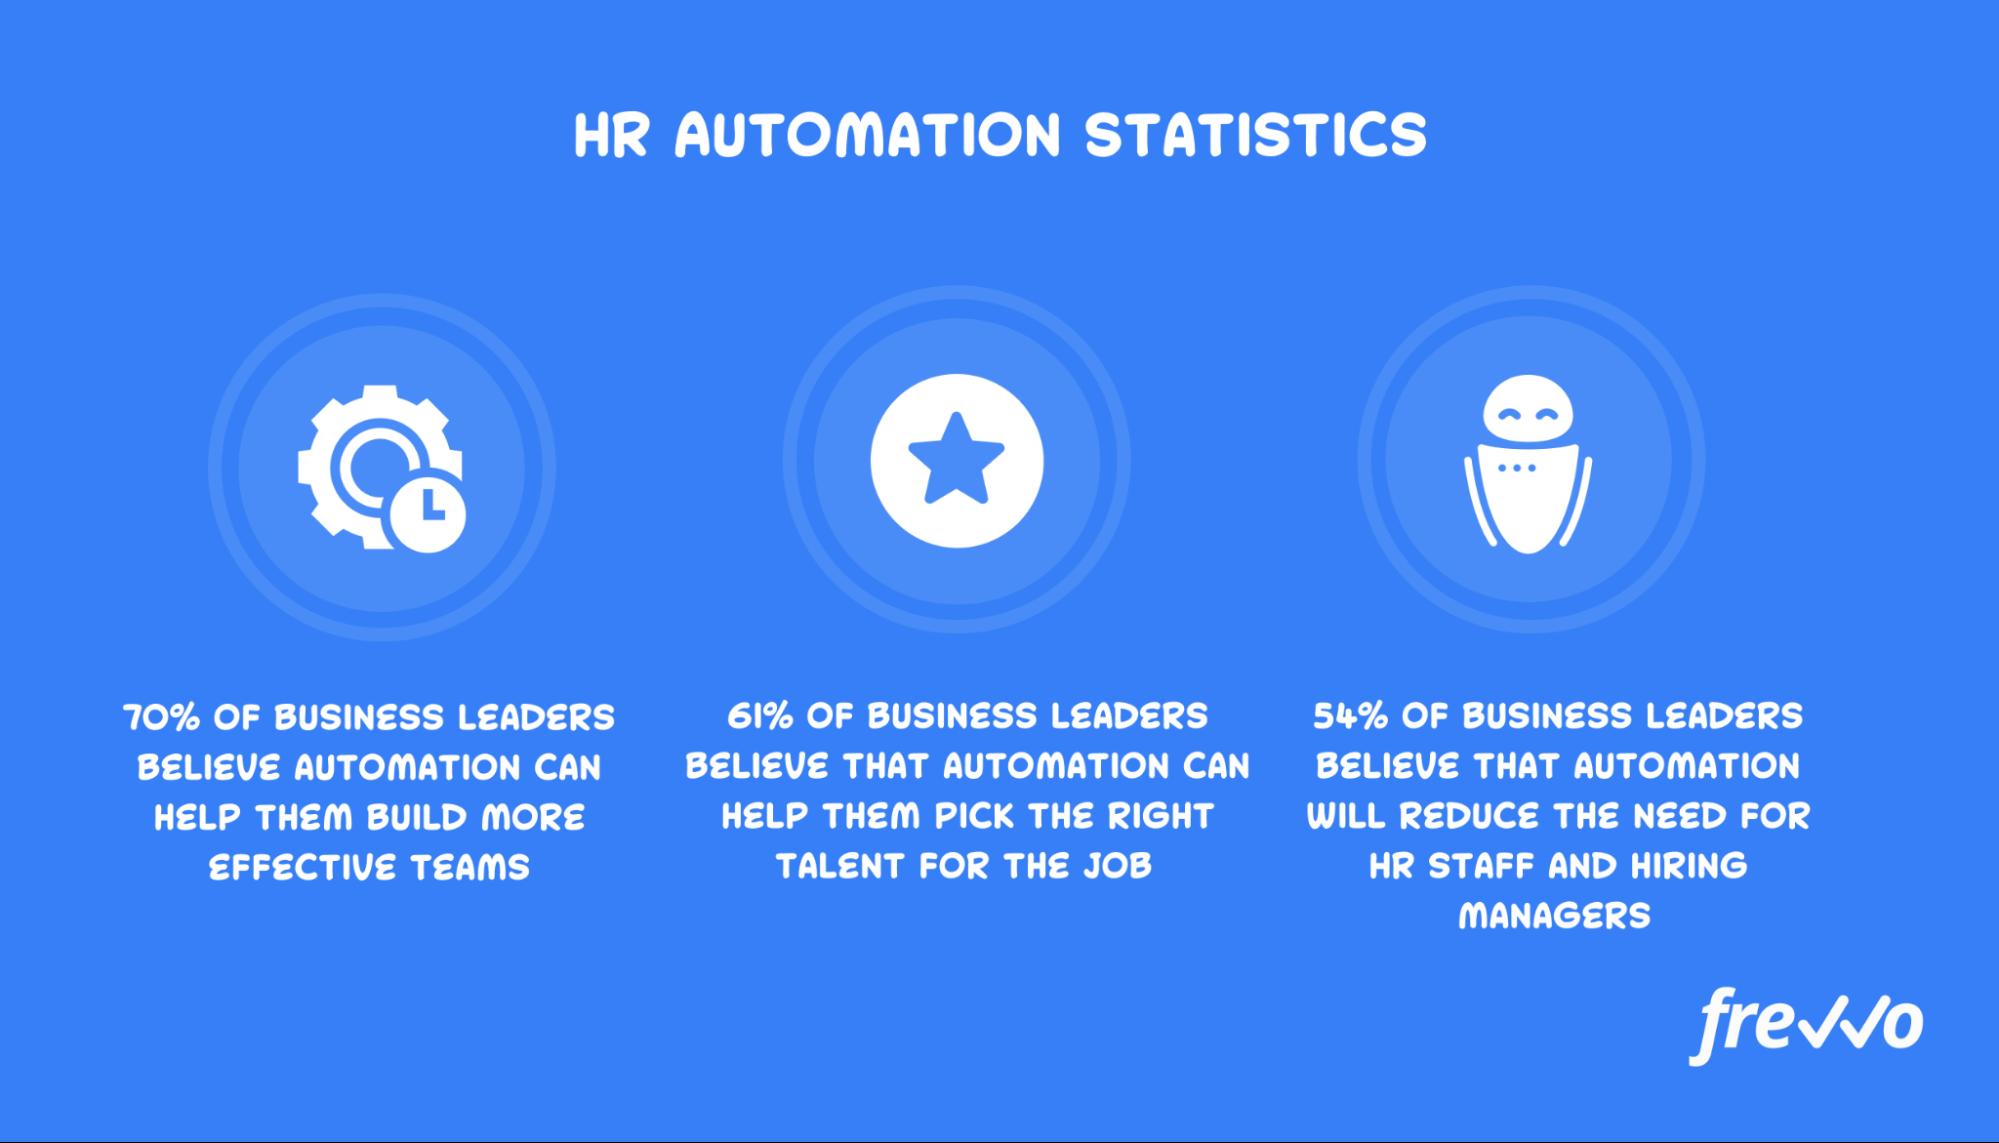 HR automation statistics